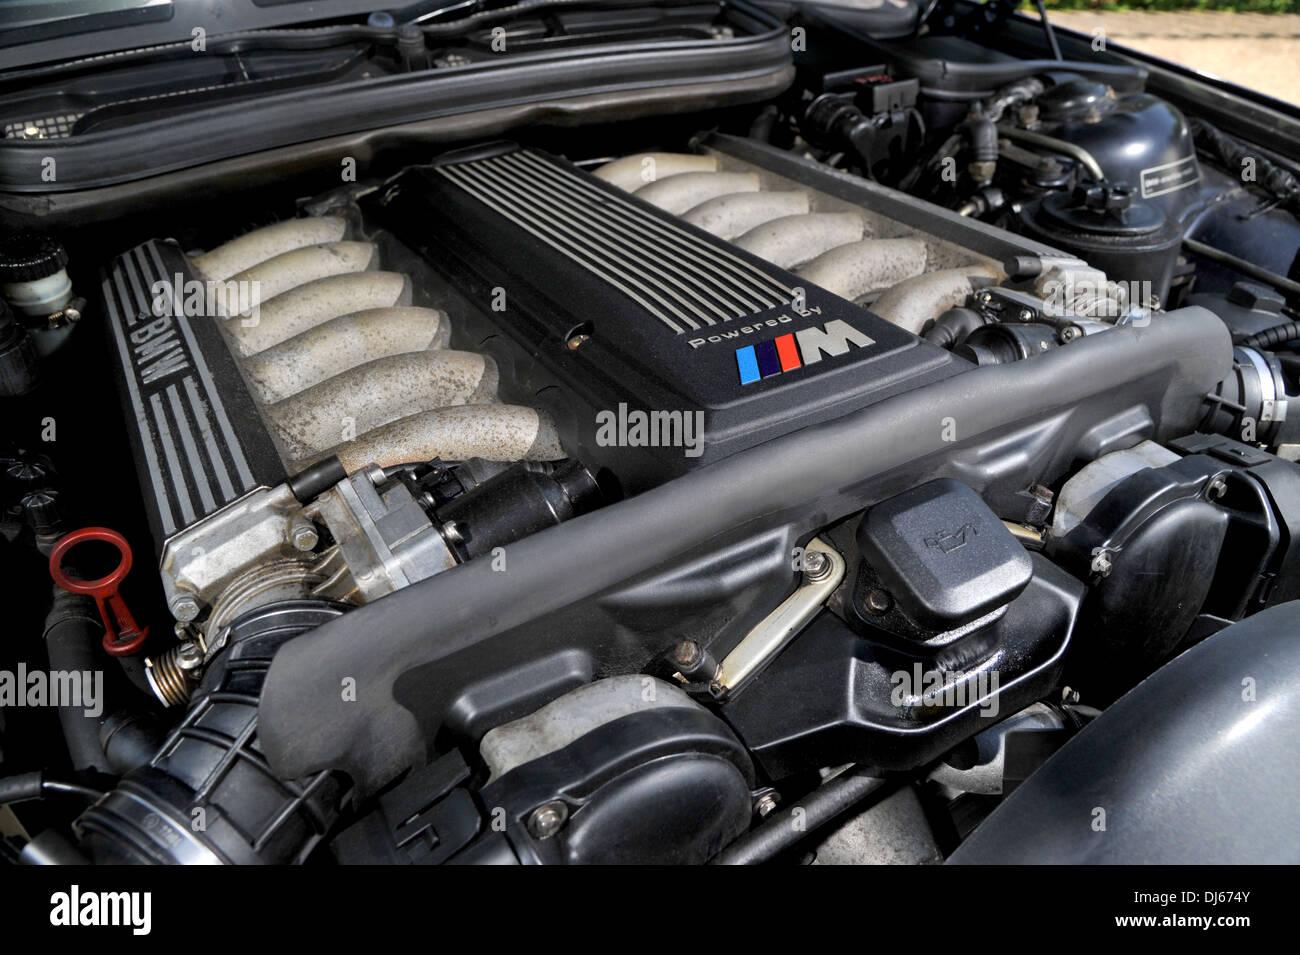 1993 BMW 850i German V8 Super Coupe Now A Classic Car